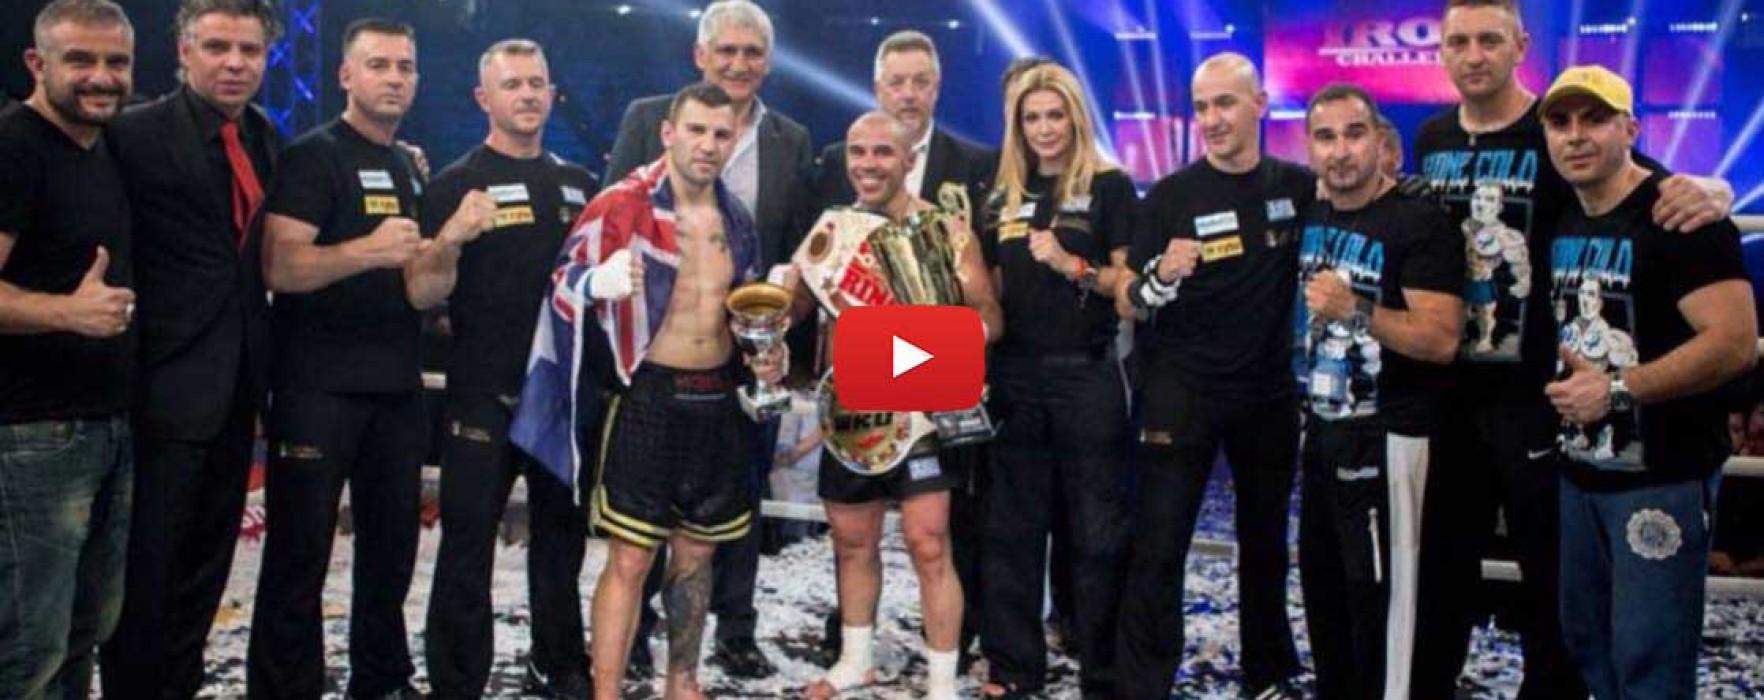 Video: Mike Zambidis vs Steve Moxon – Iron Challenge 2015 – Greece 27/06/2015